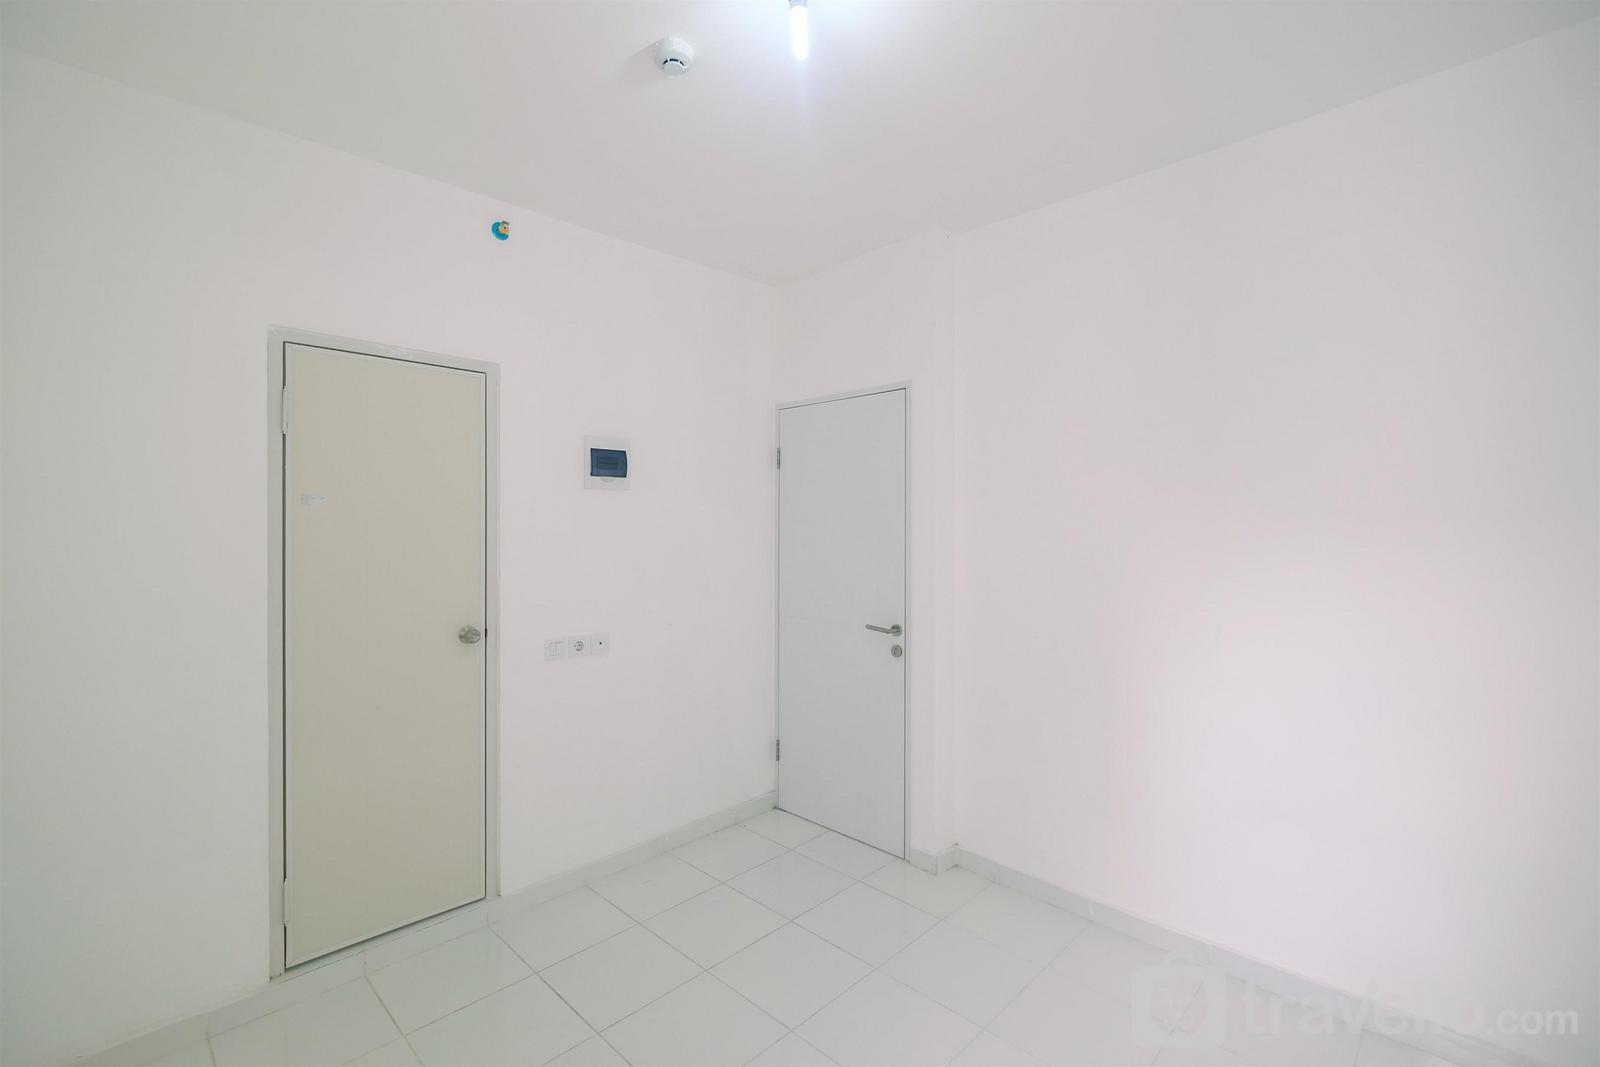 Apartemen Aeropolis Residence - Unfurnished Apartment Studio with AC Aeropolis Residence near Soetta By Travelio